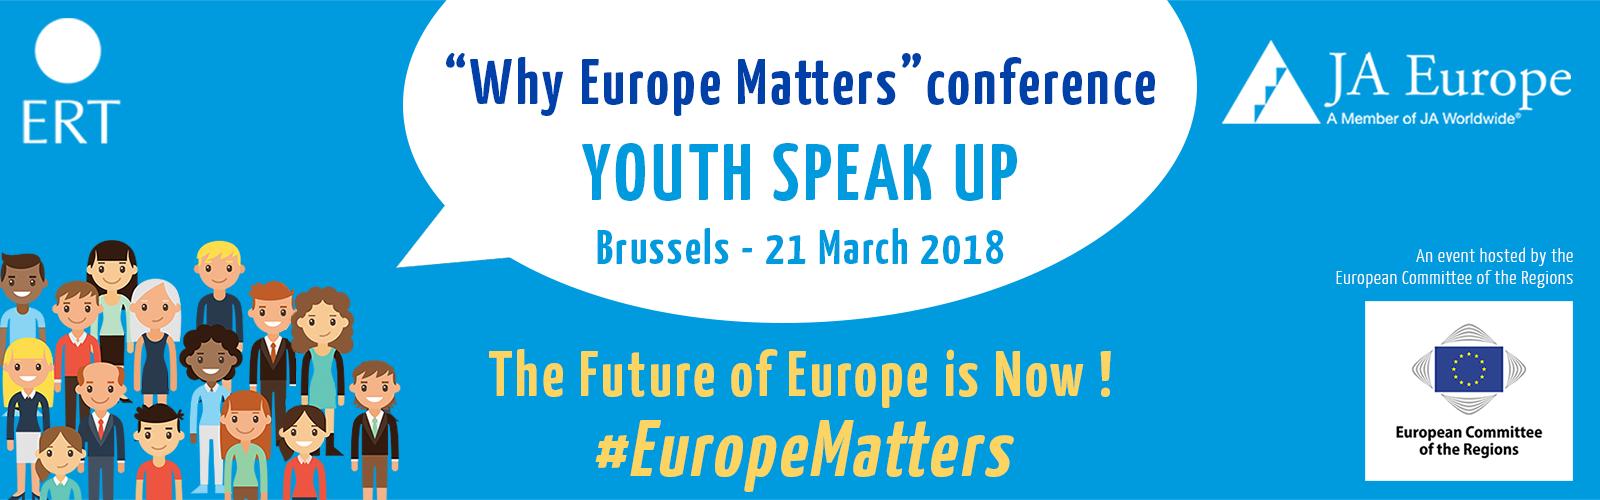 WEM-Conference-YouthSpeakUp